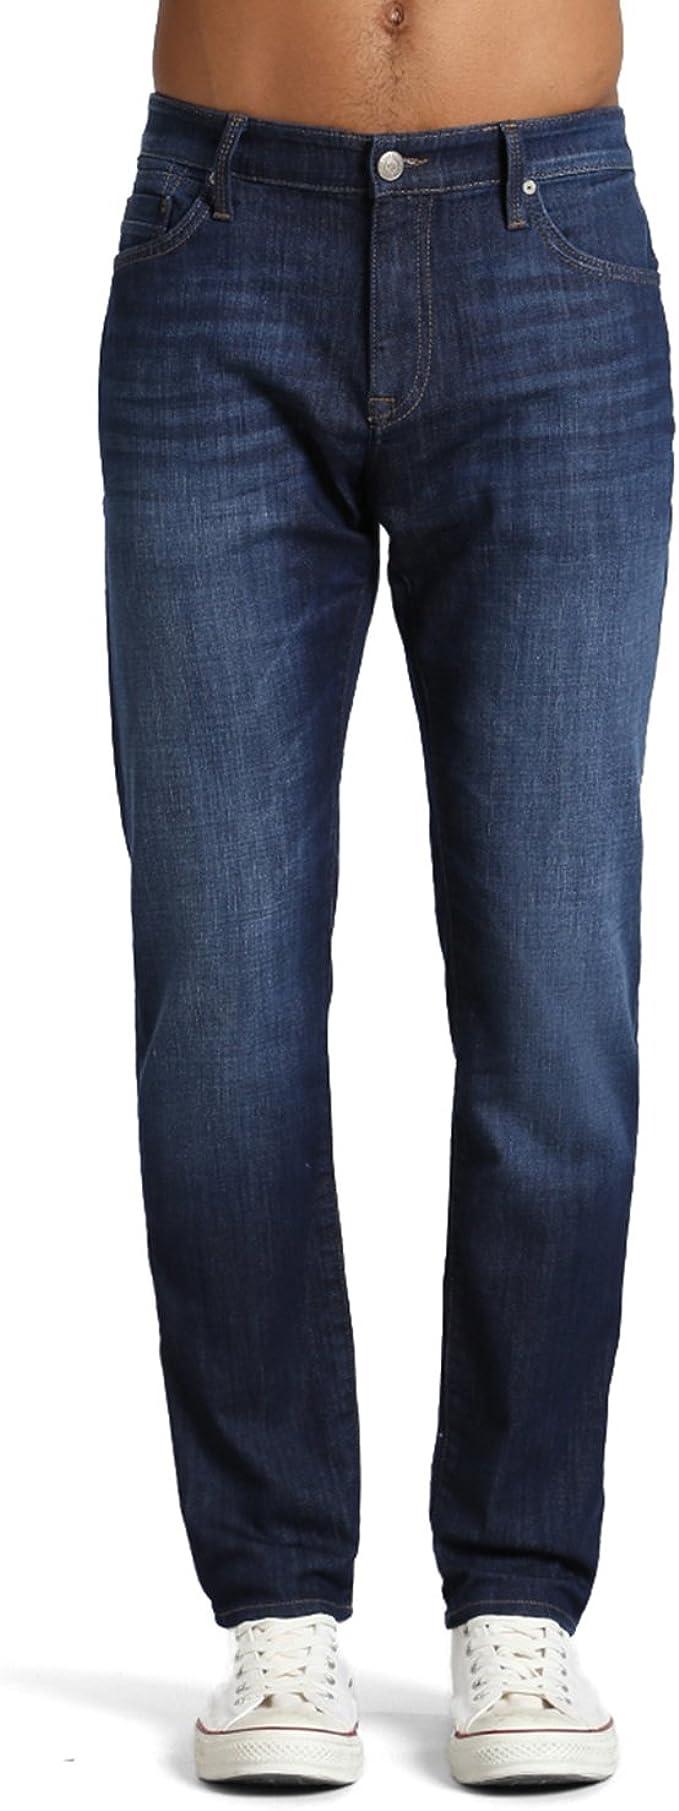 Used Look Men/'s Jeans Pants Regular Slim Mavi Blue Marcus